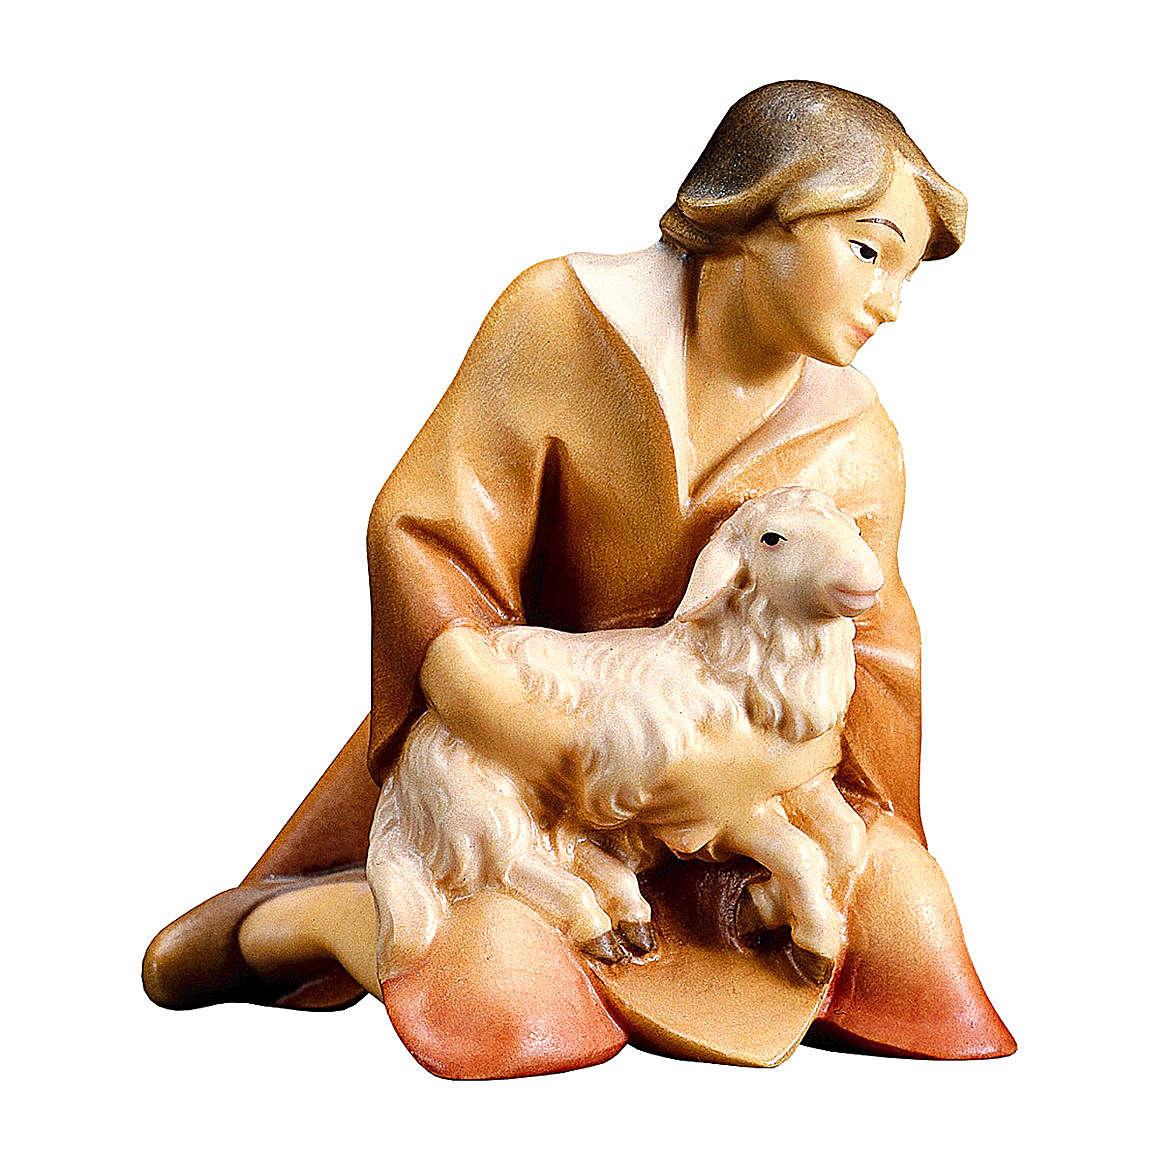 Pastore inginocchiato con agnello presepe Original Redentore legno dipinto in Valgardena 10 cm 4